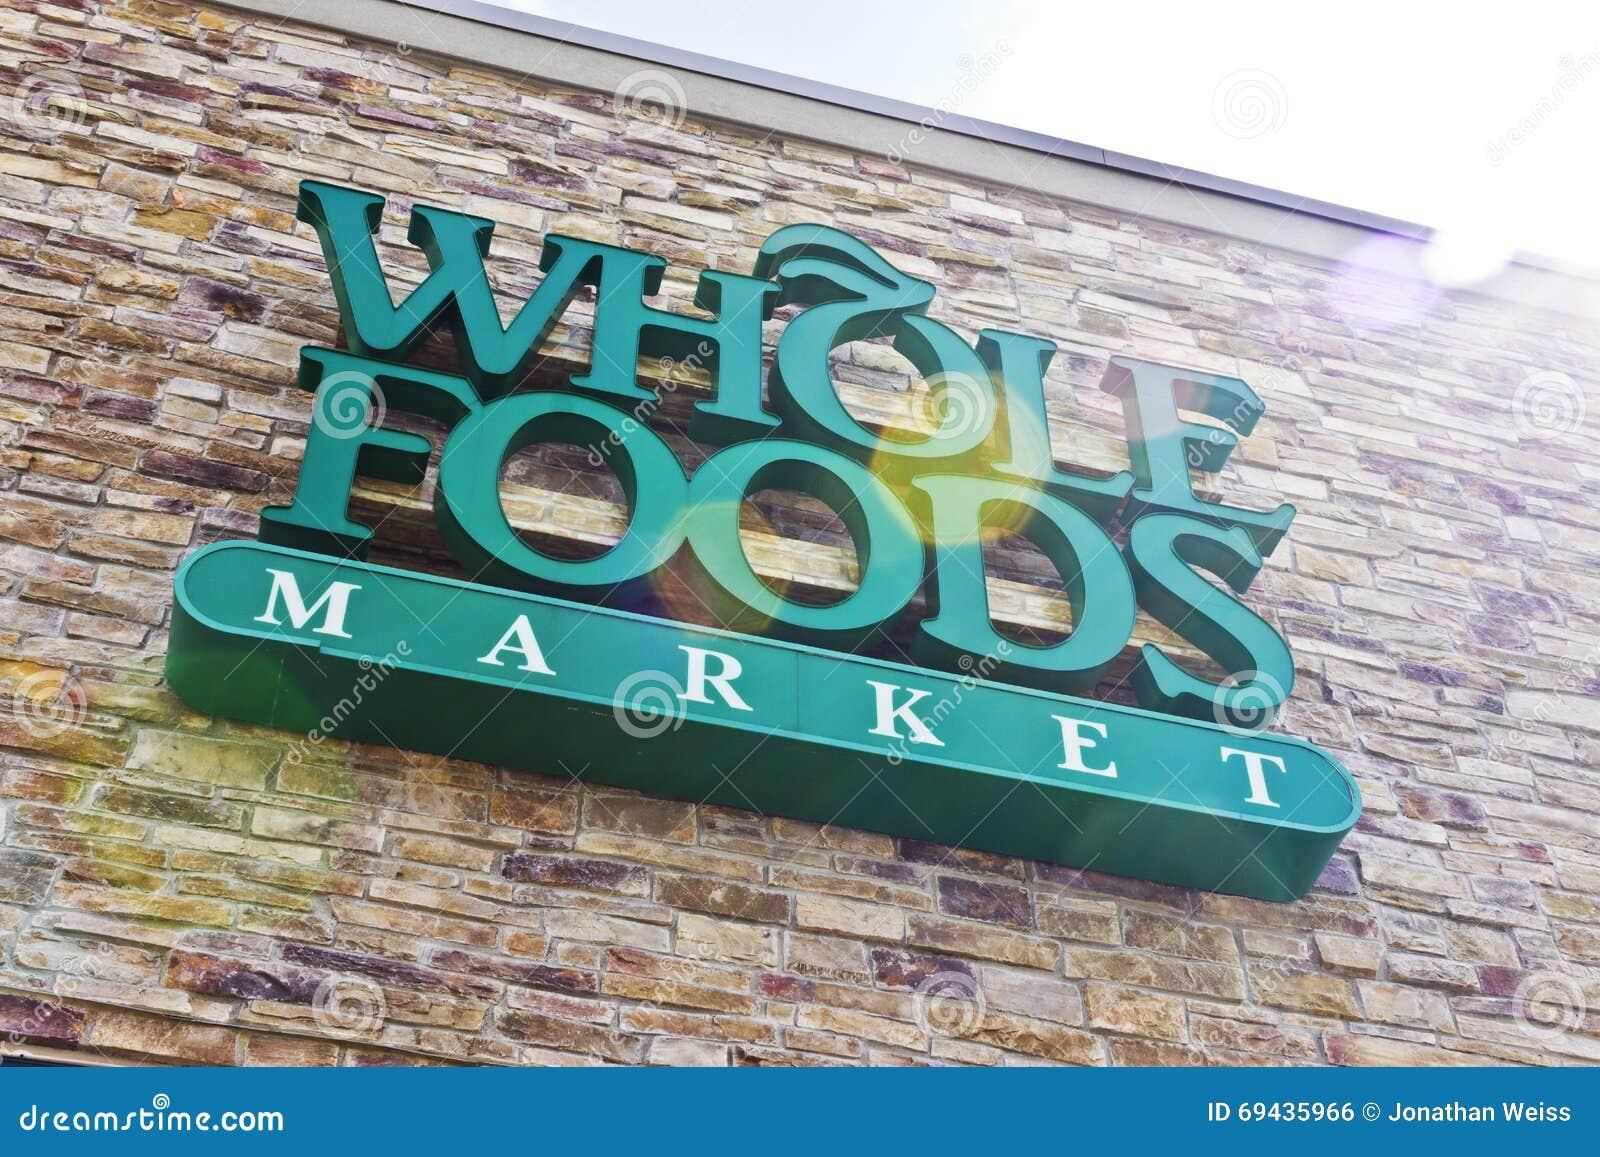 Indianapolis - Circa April 2016: Whole Foods Market II